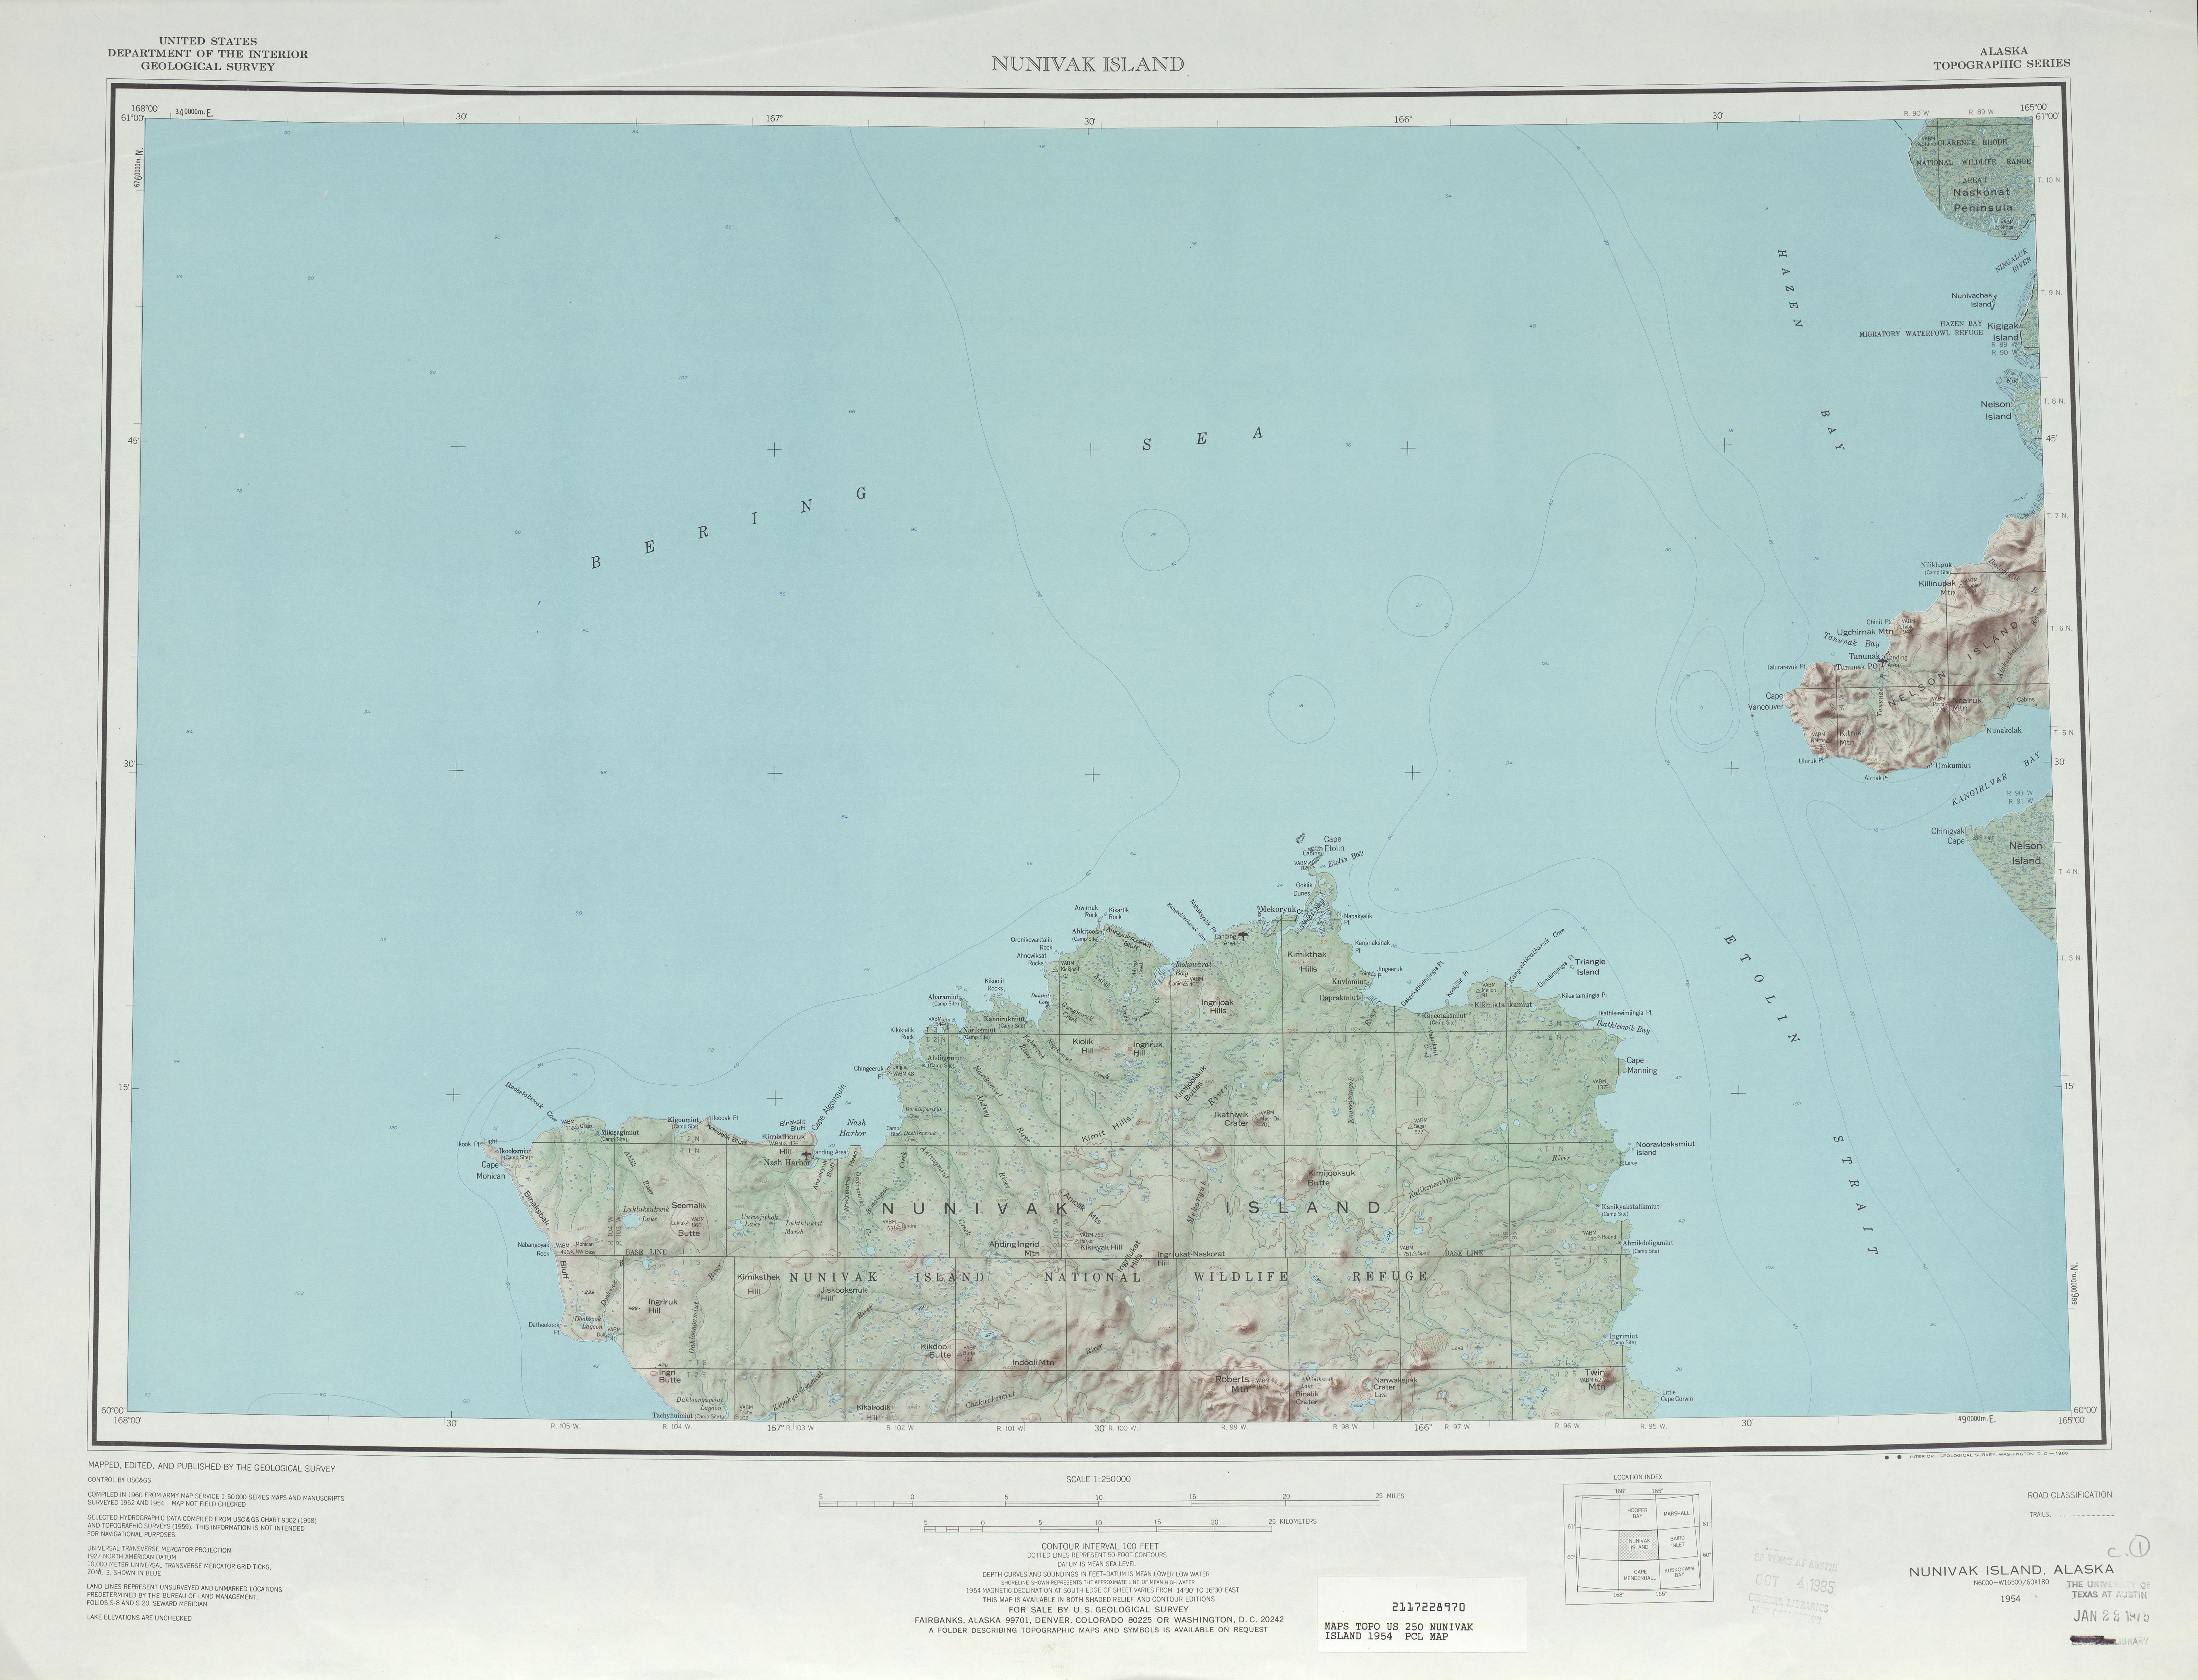 Nunivak Island Topographic Map Sheet, United States 1954